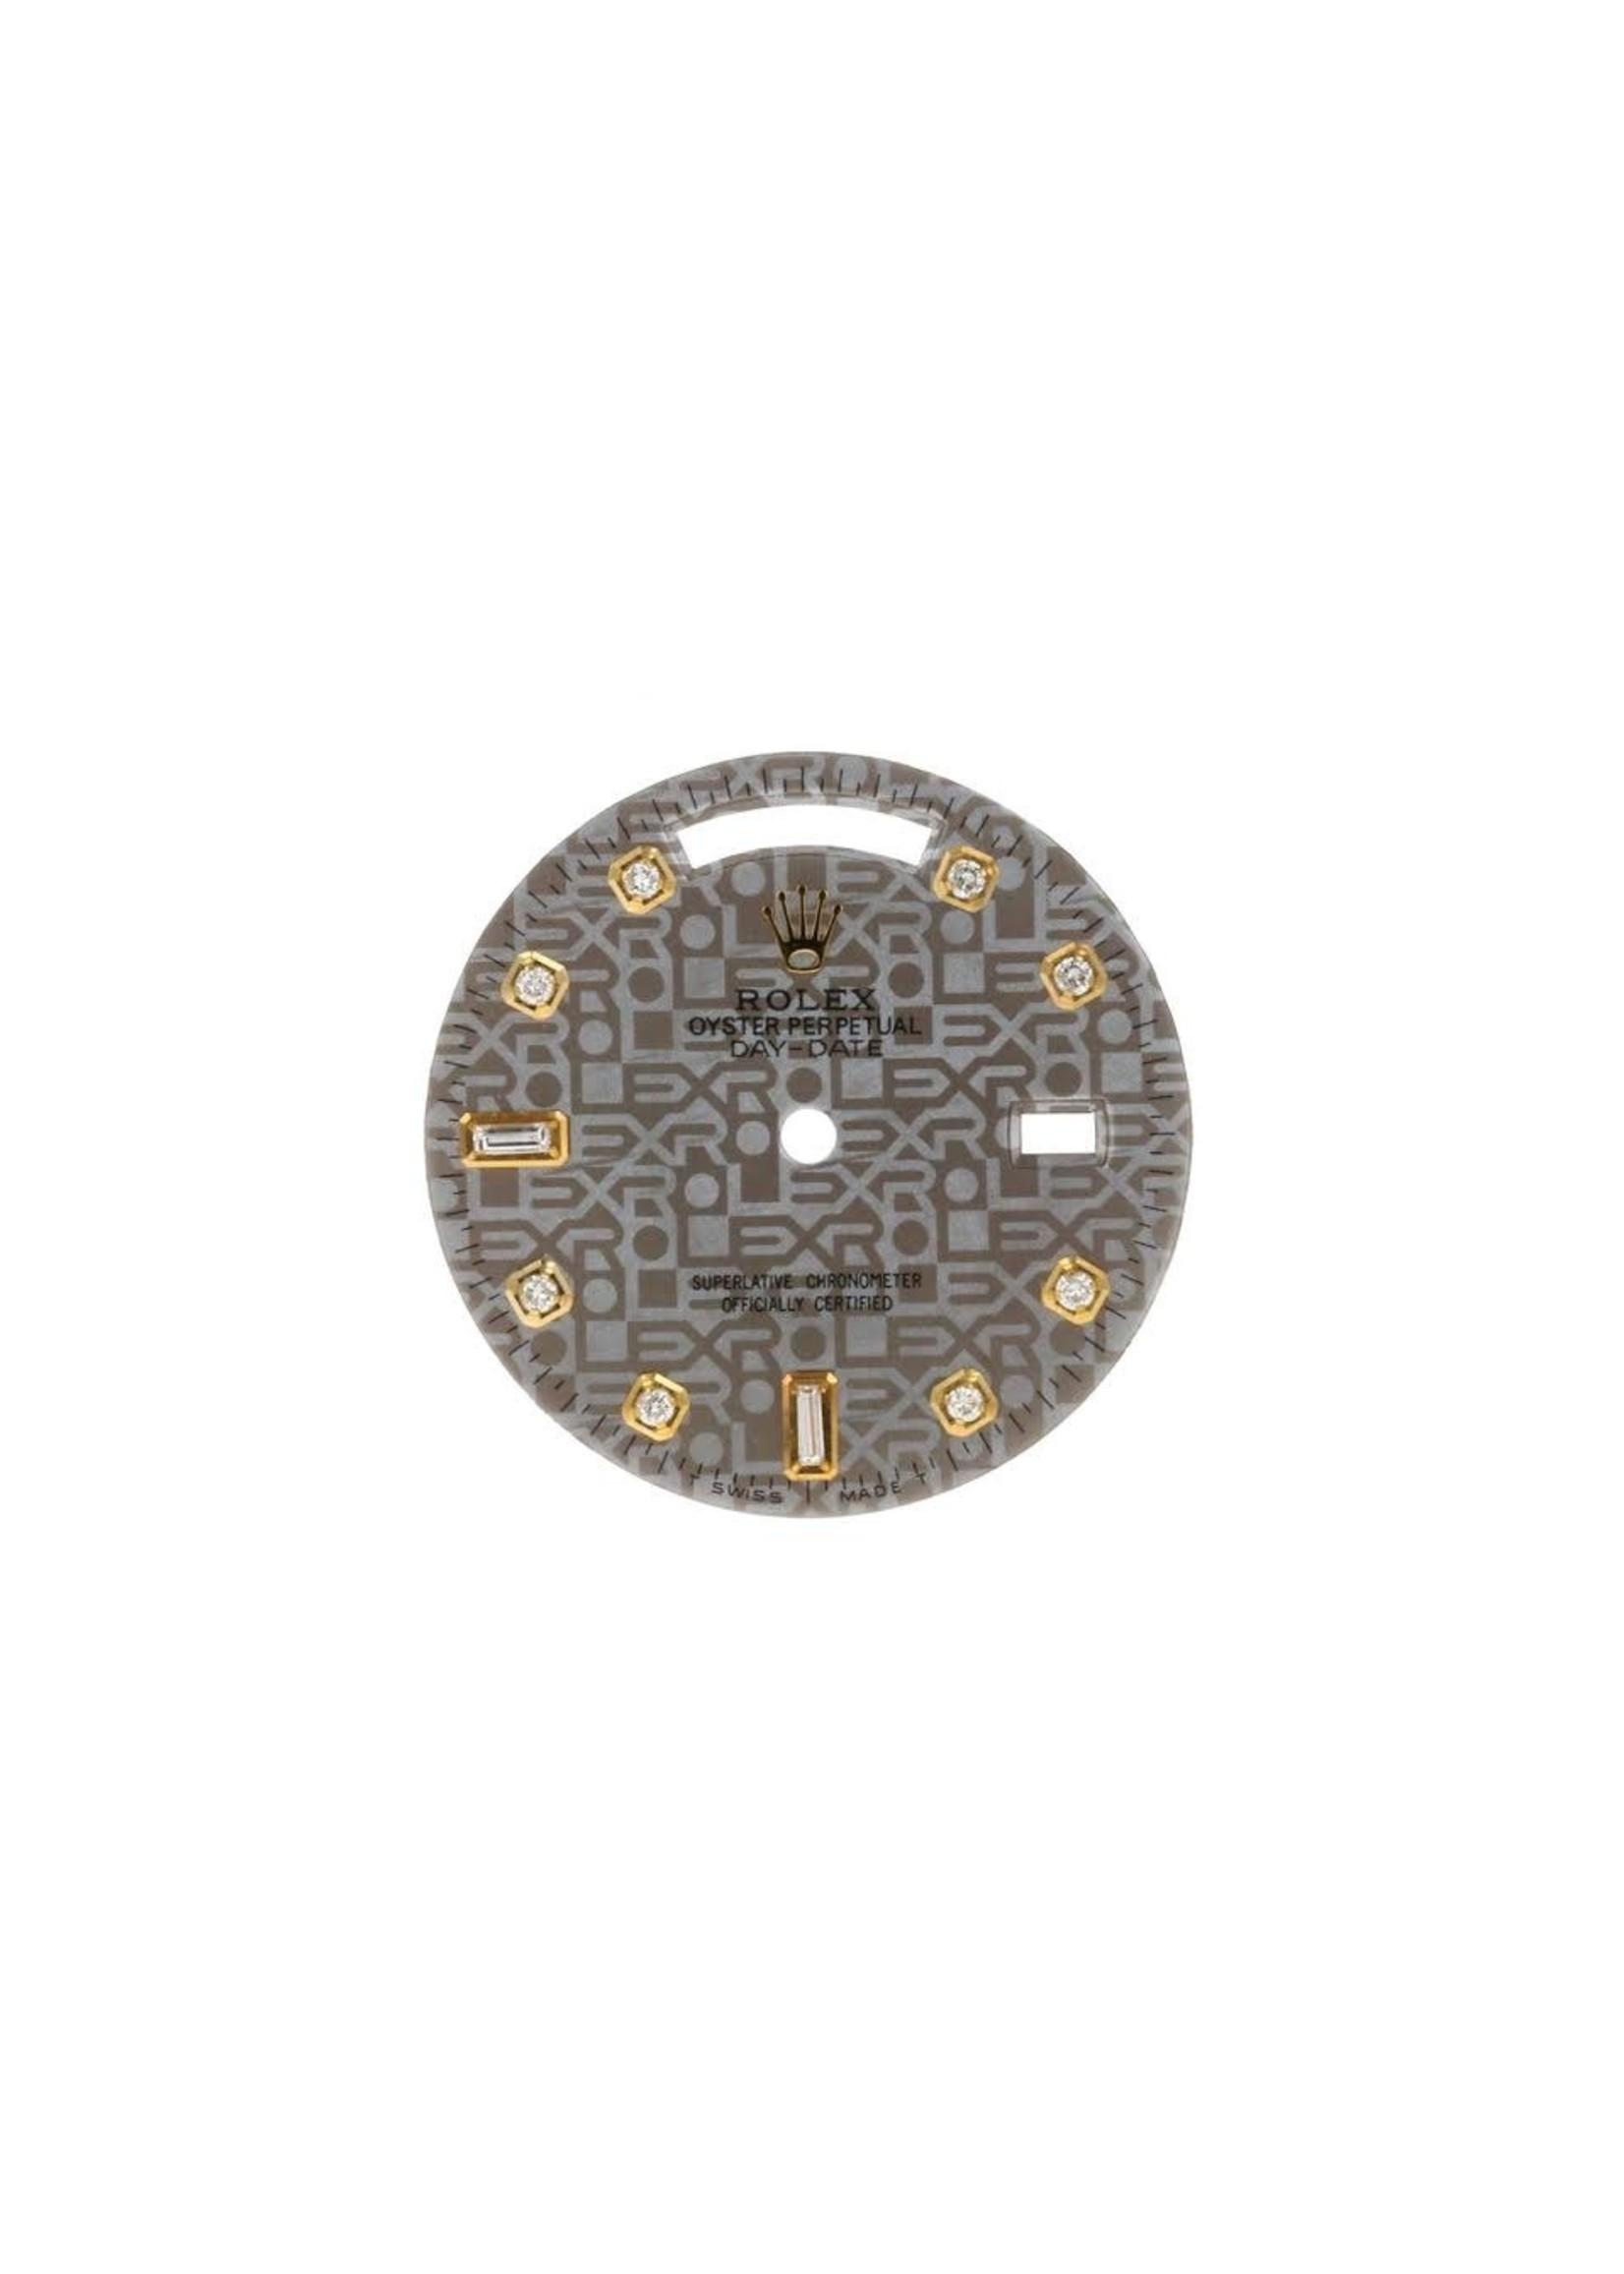 Rolex CUSTOM ROLEX DAY DATE 36MM DIAMOND DIAL